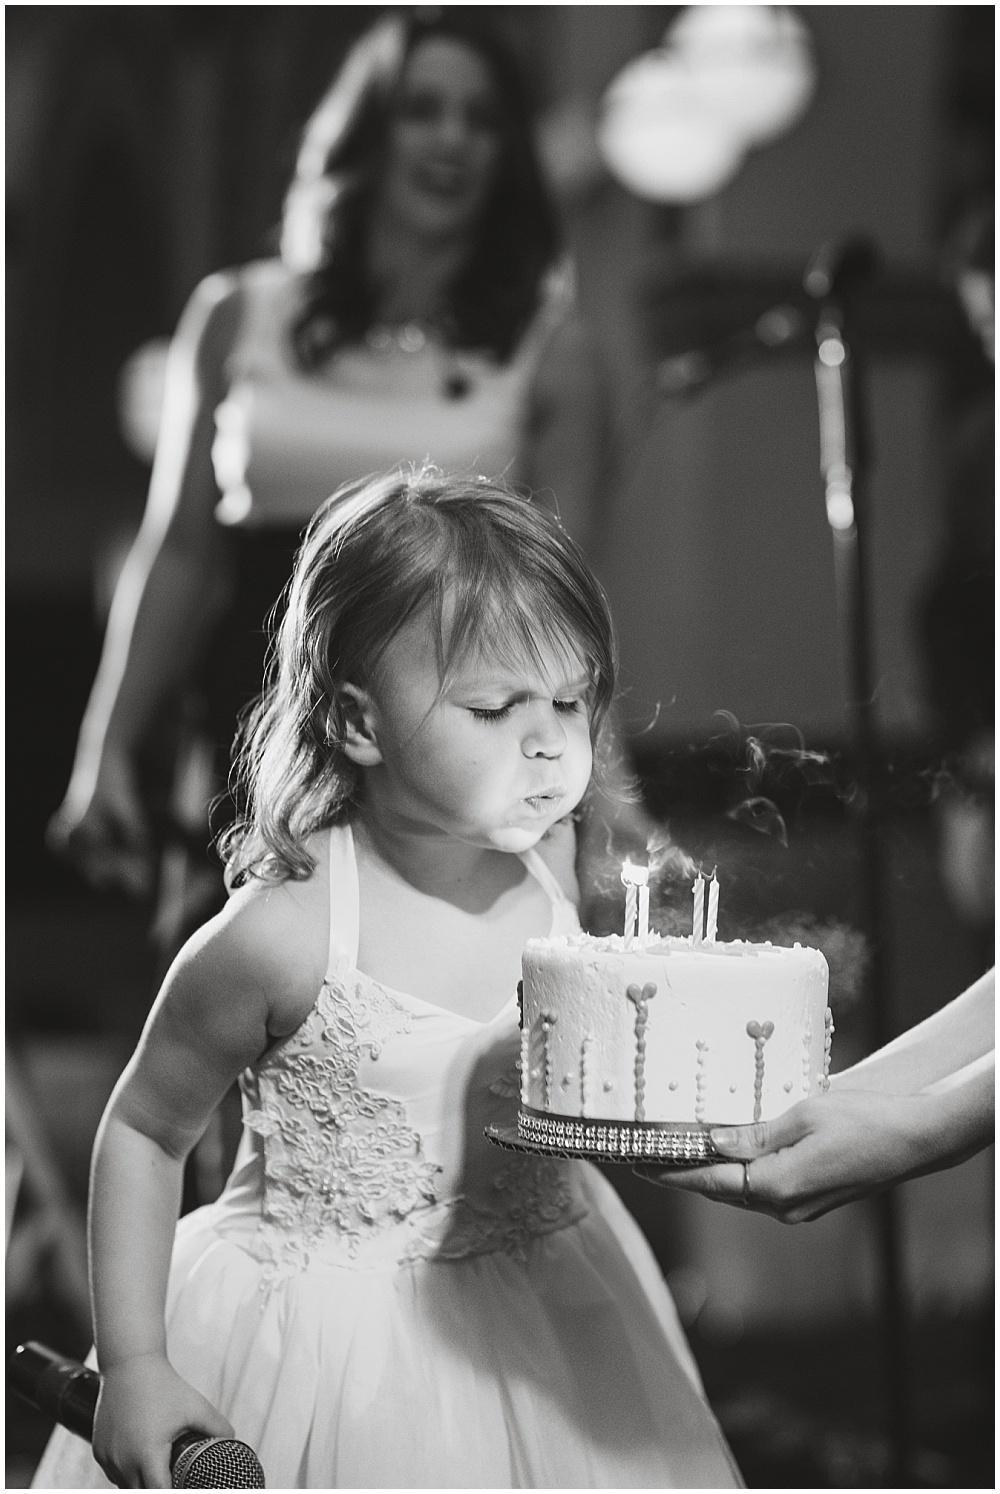 Surprise Flower Girl Birthday Cake | Downtown Indianapolis Wedding by Gabrielle Cheikh Photography & Jessica Dum Wedding Coordination